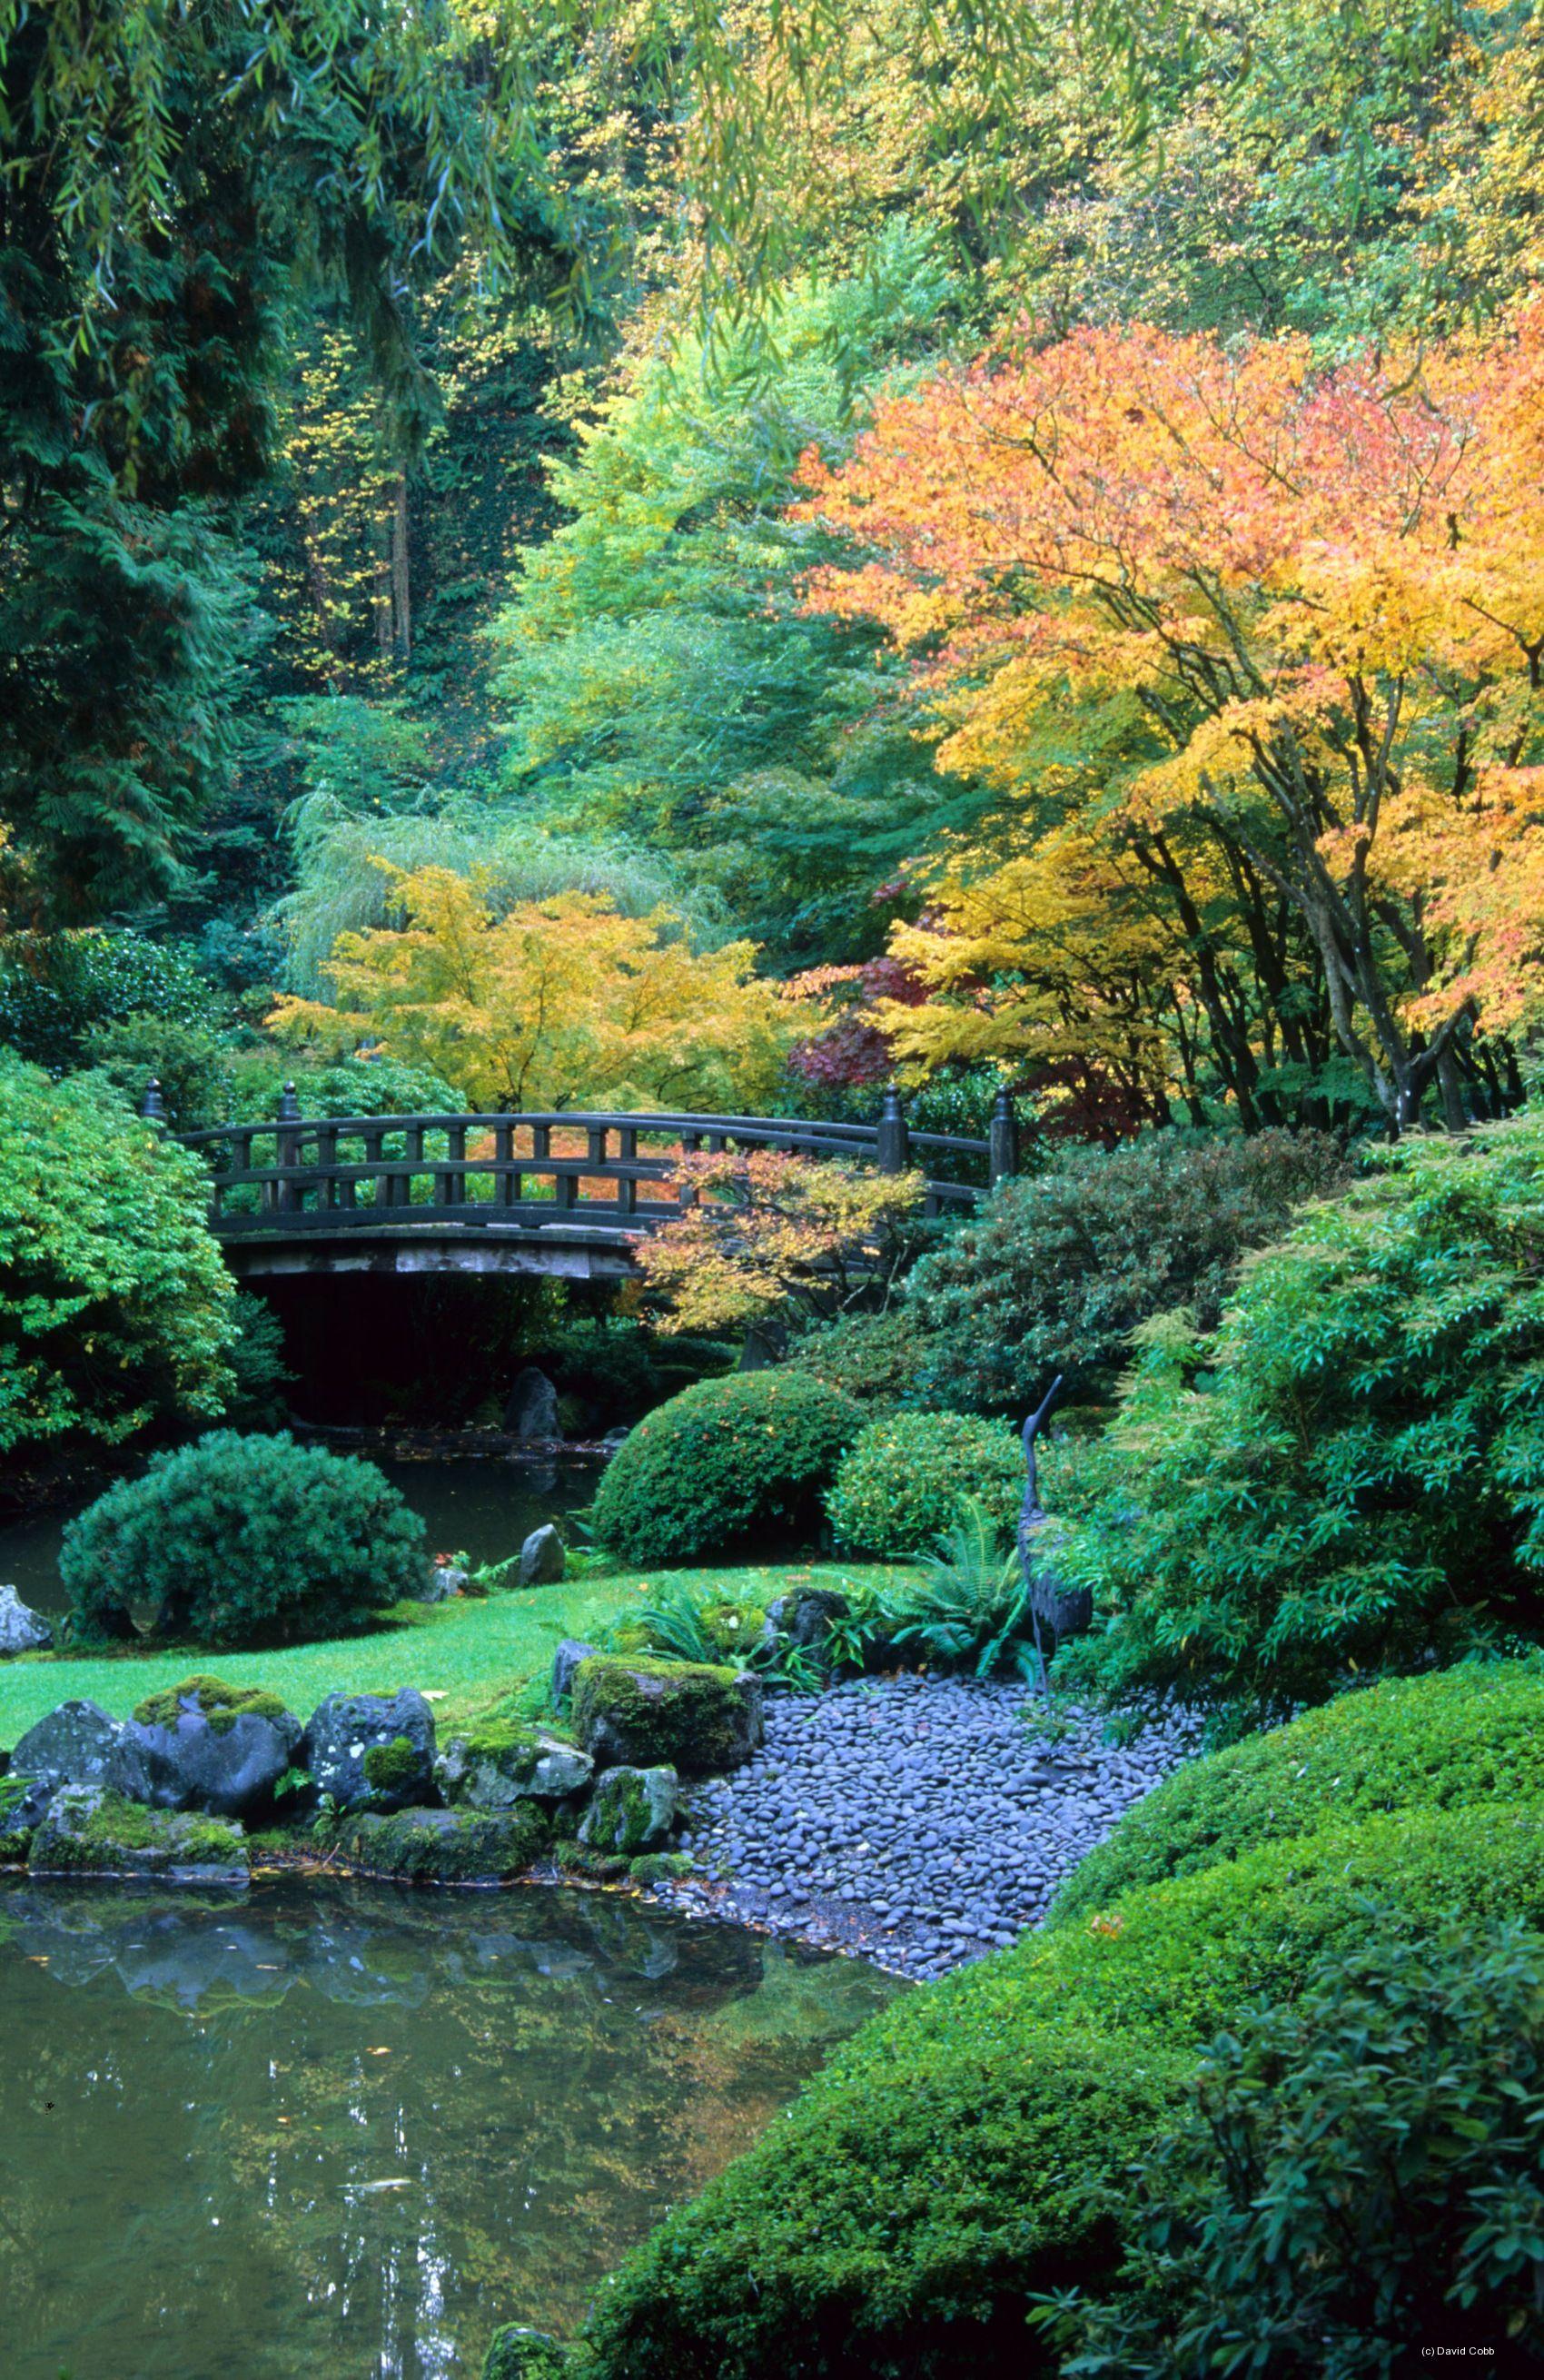 Portland Japanese Garden Store: Strolling Garden At Portland Japanese Garden, Oregon-Photo